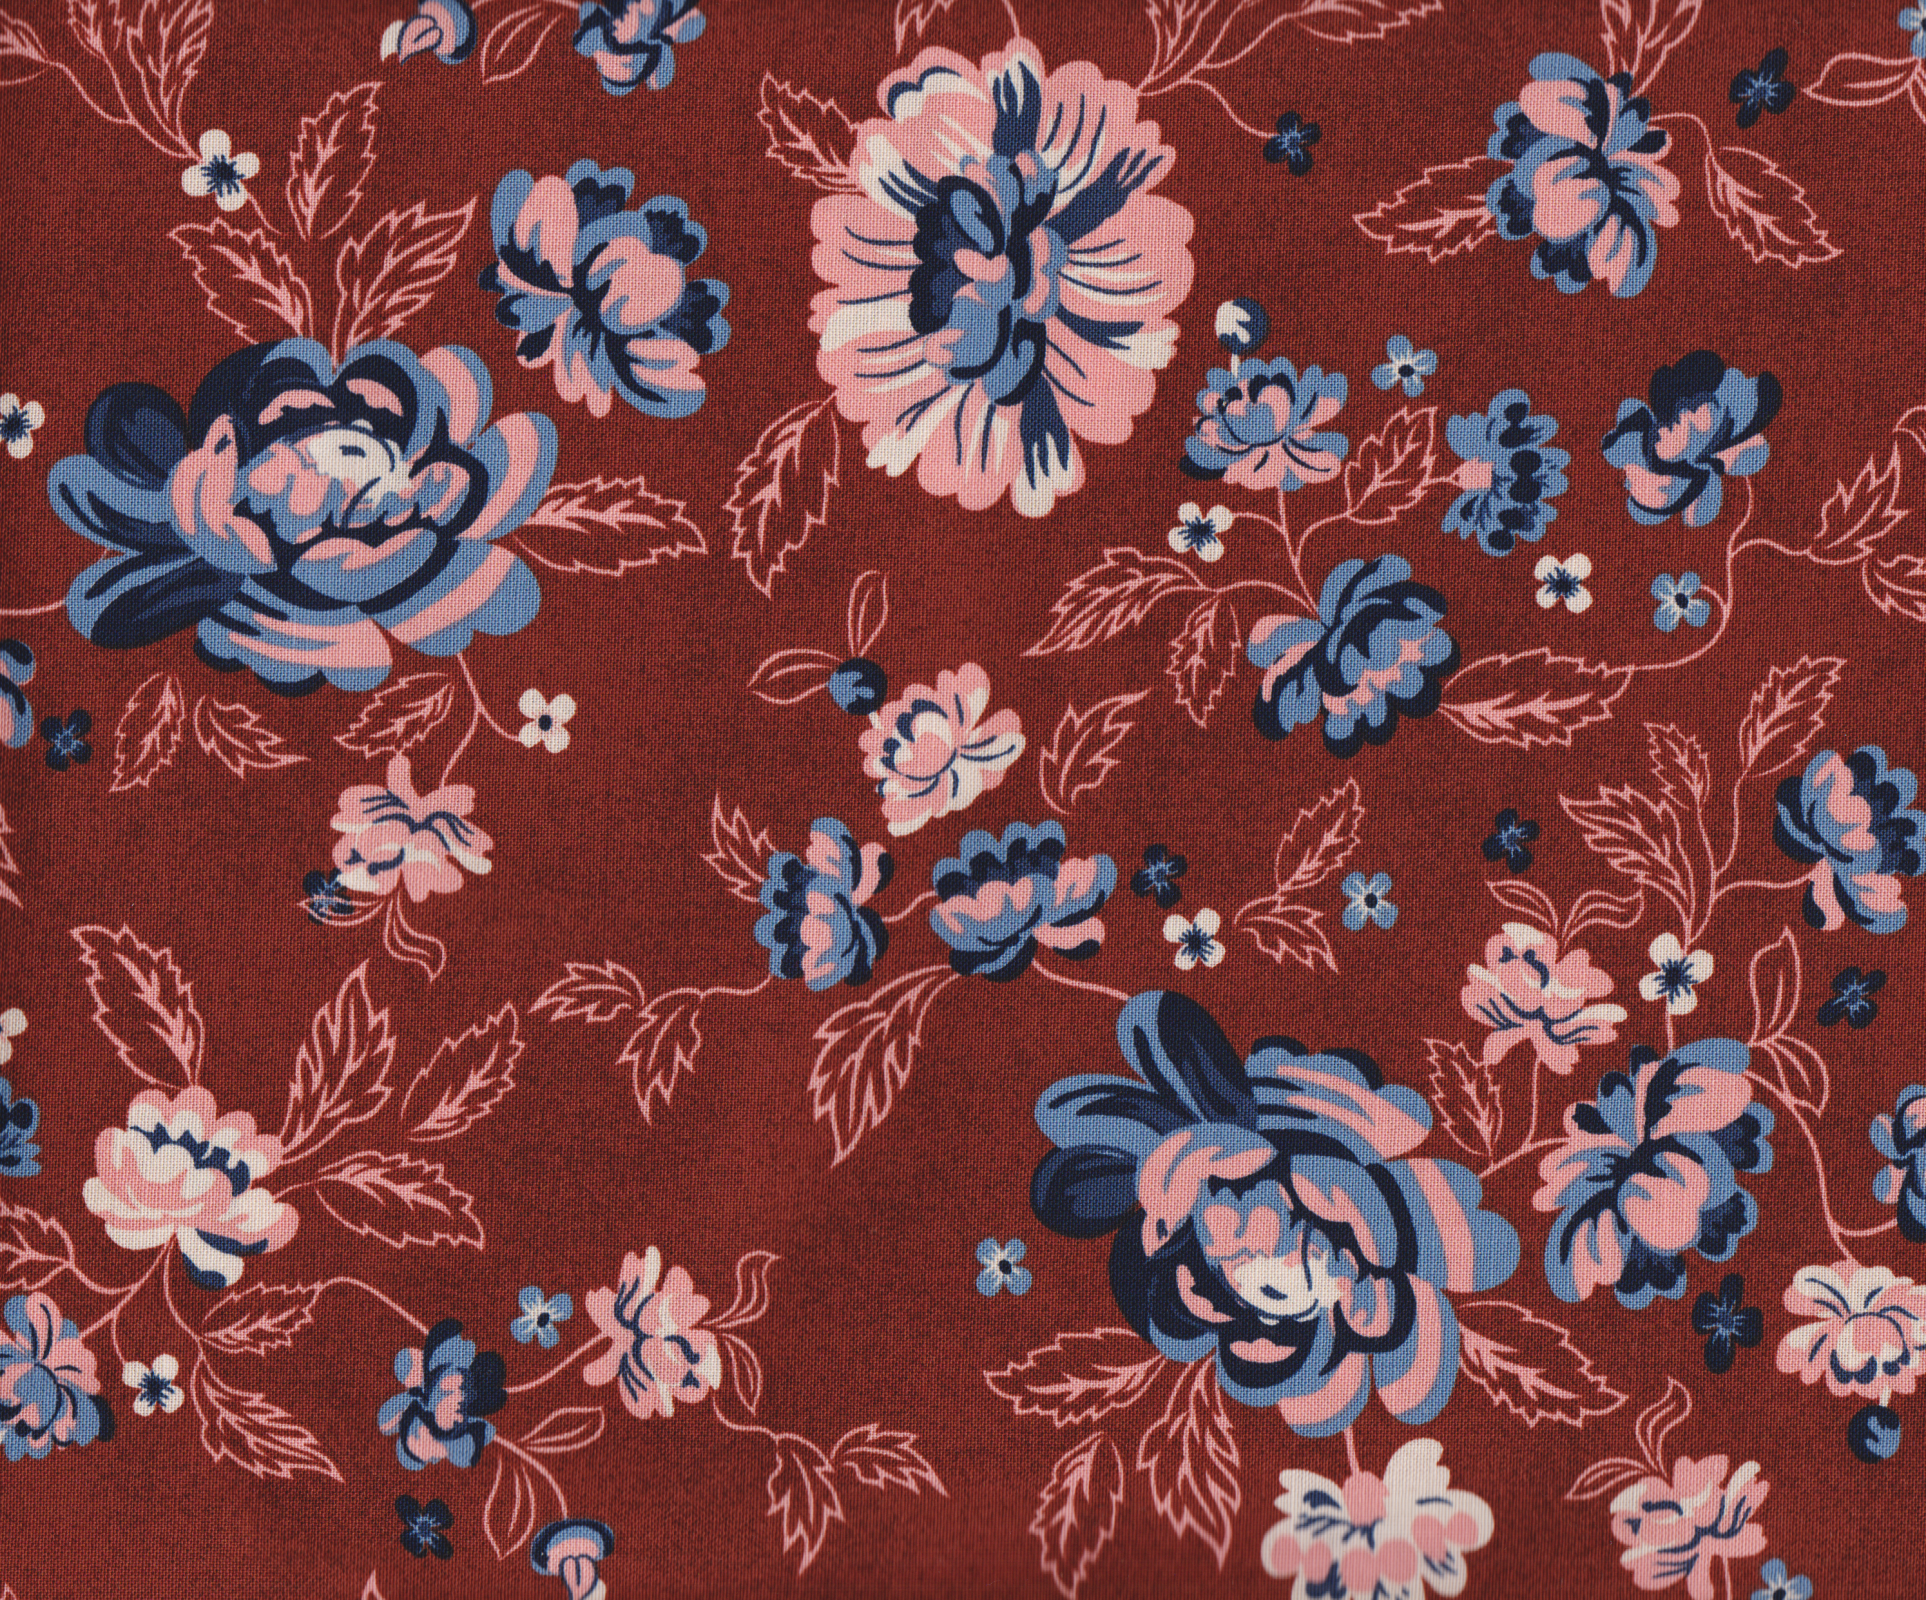 PROMO* Boundless Pre Cuts - 82091 Medium Floral